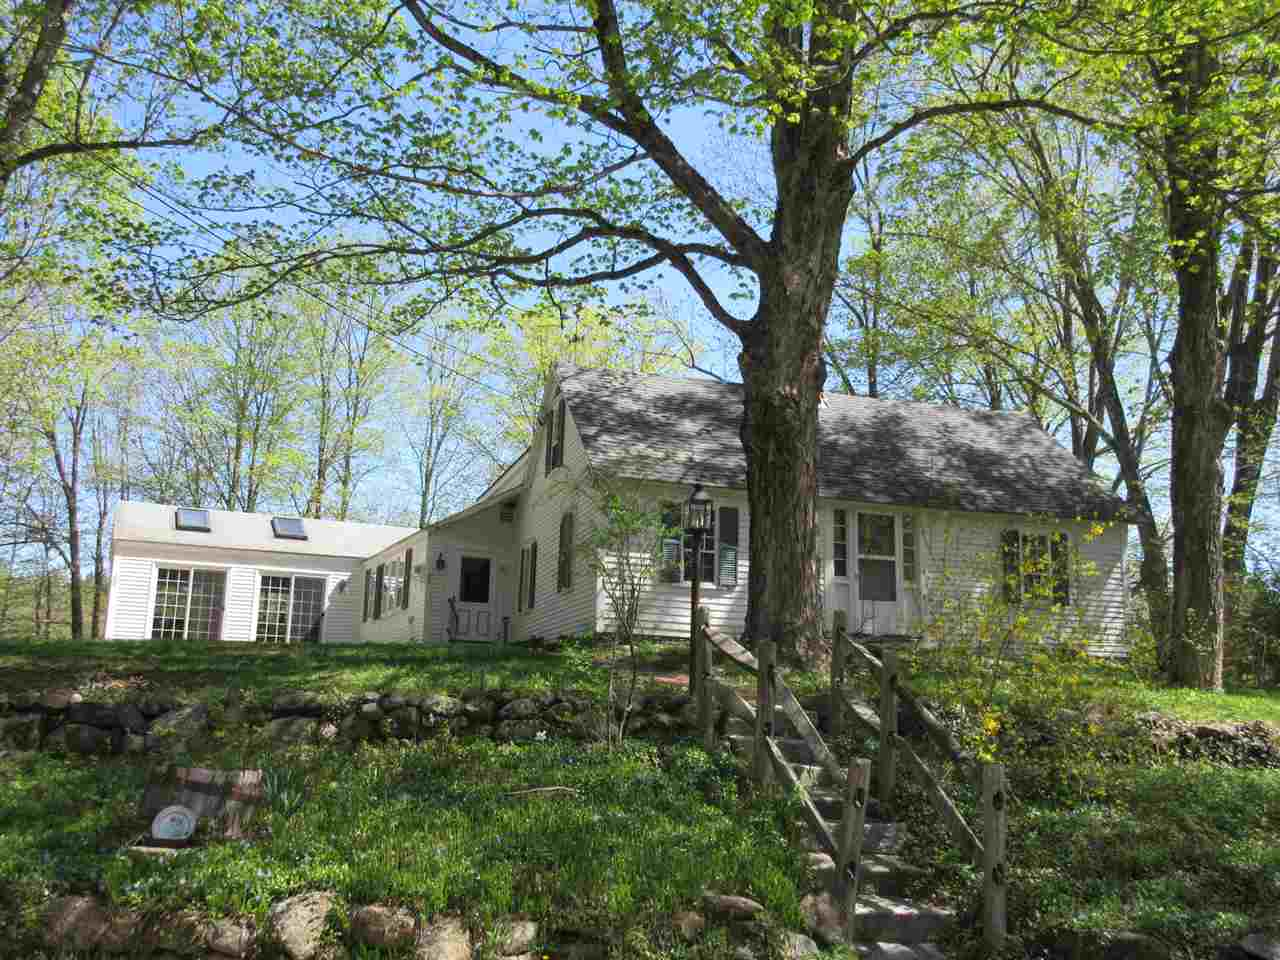 Antique,Cape, Single Family - Francestown, NH (photo 1)